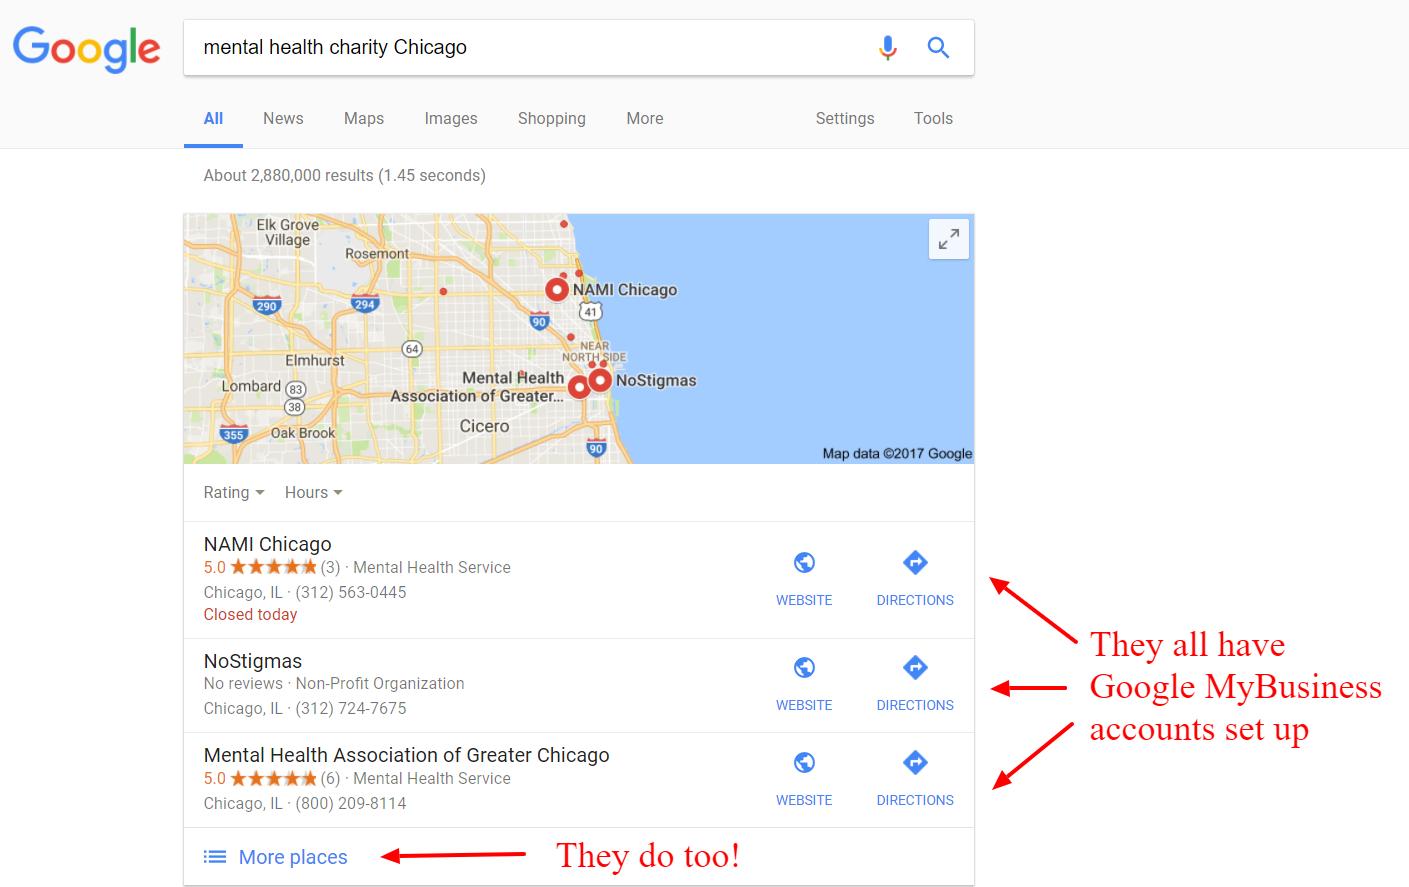 google-mybusiness-listings-nonprofits.png